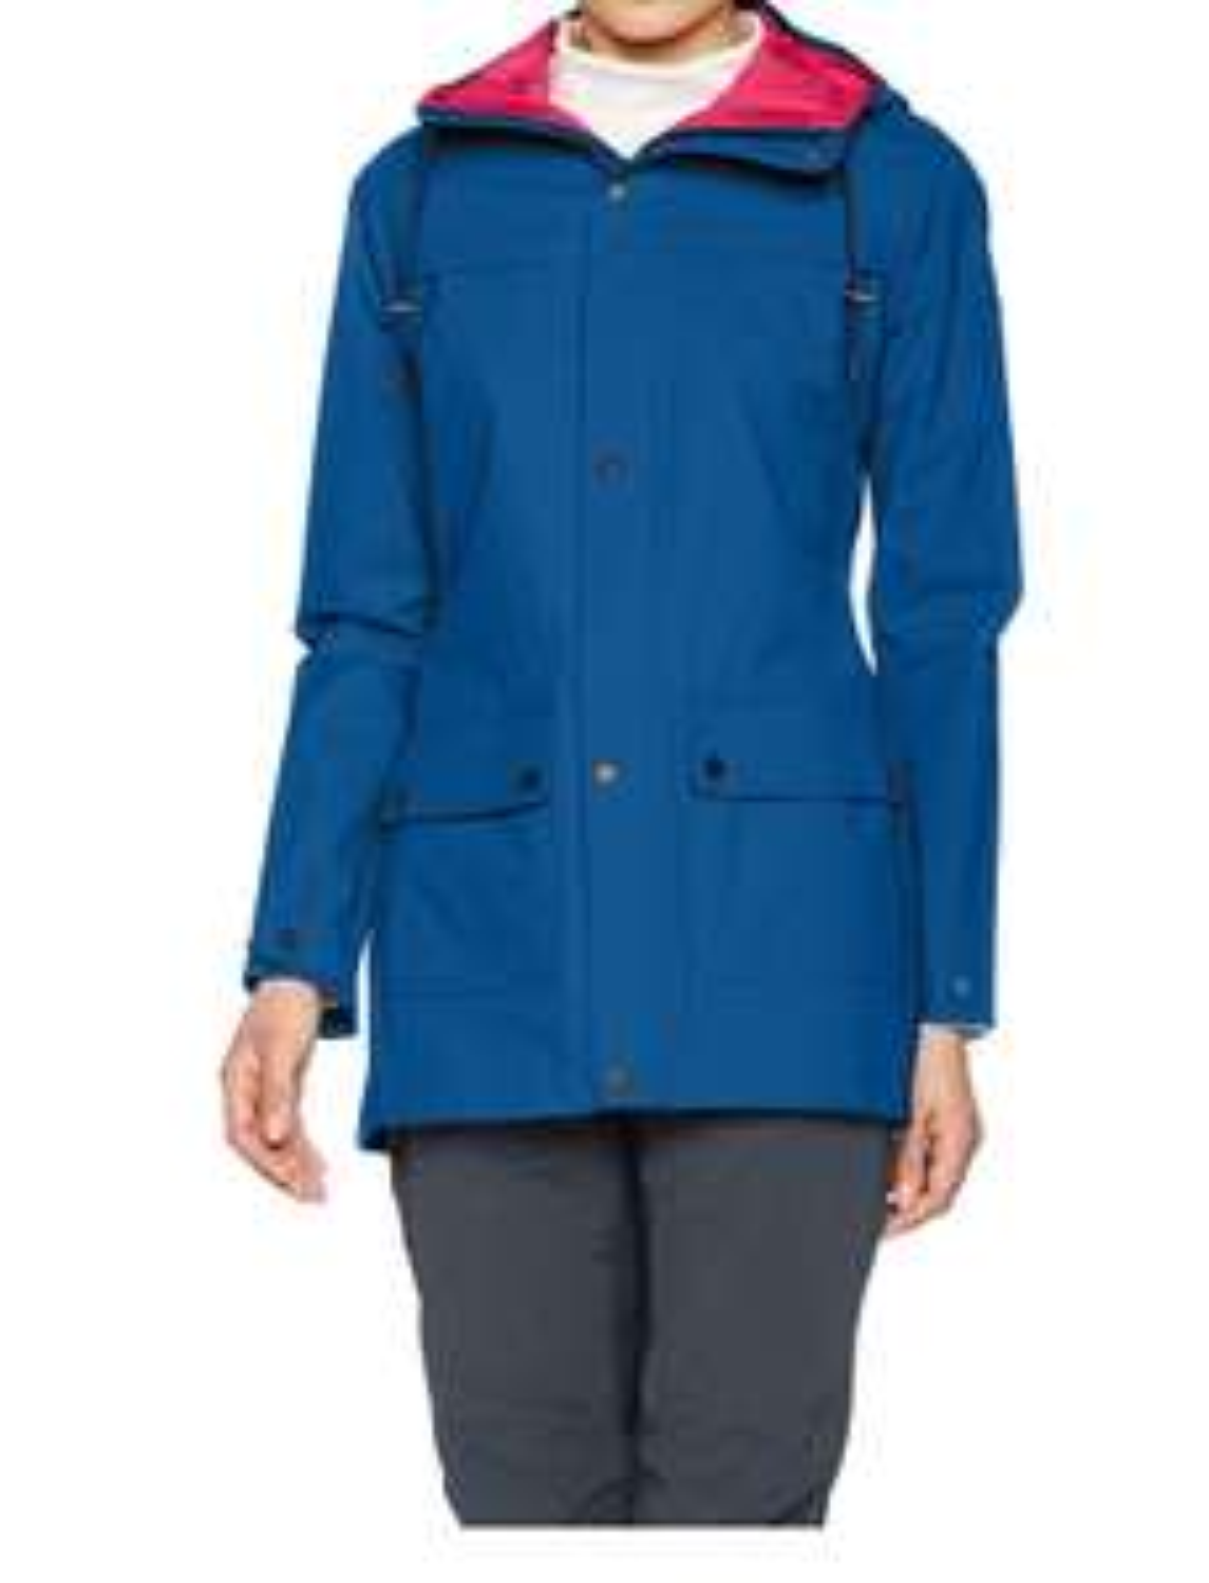 Berghaus Hambledon Women's Outdoor Jacket From £15.78 with PRIME (£3.99 non prime) @ Amazon